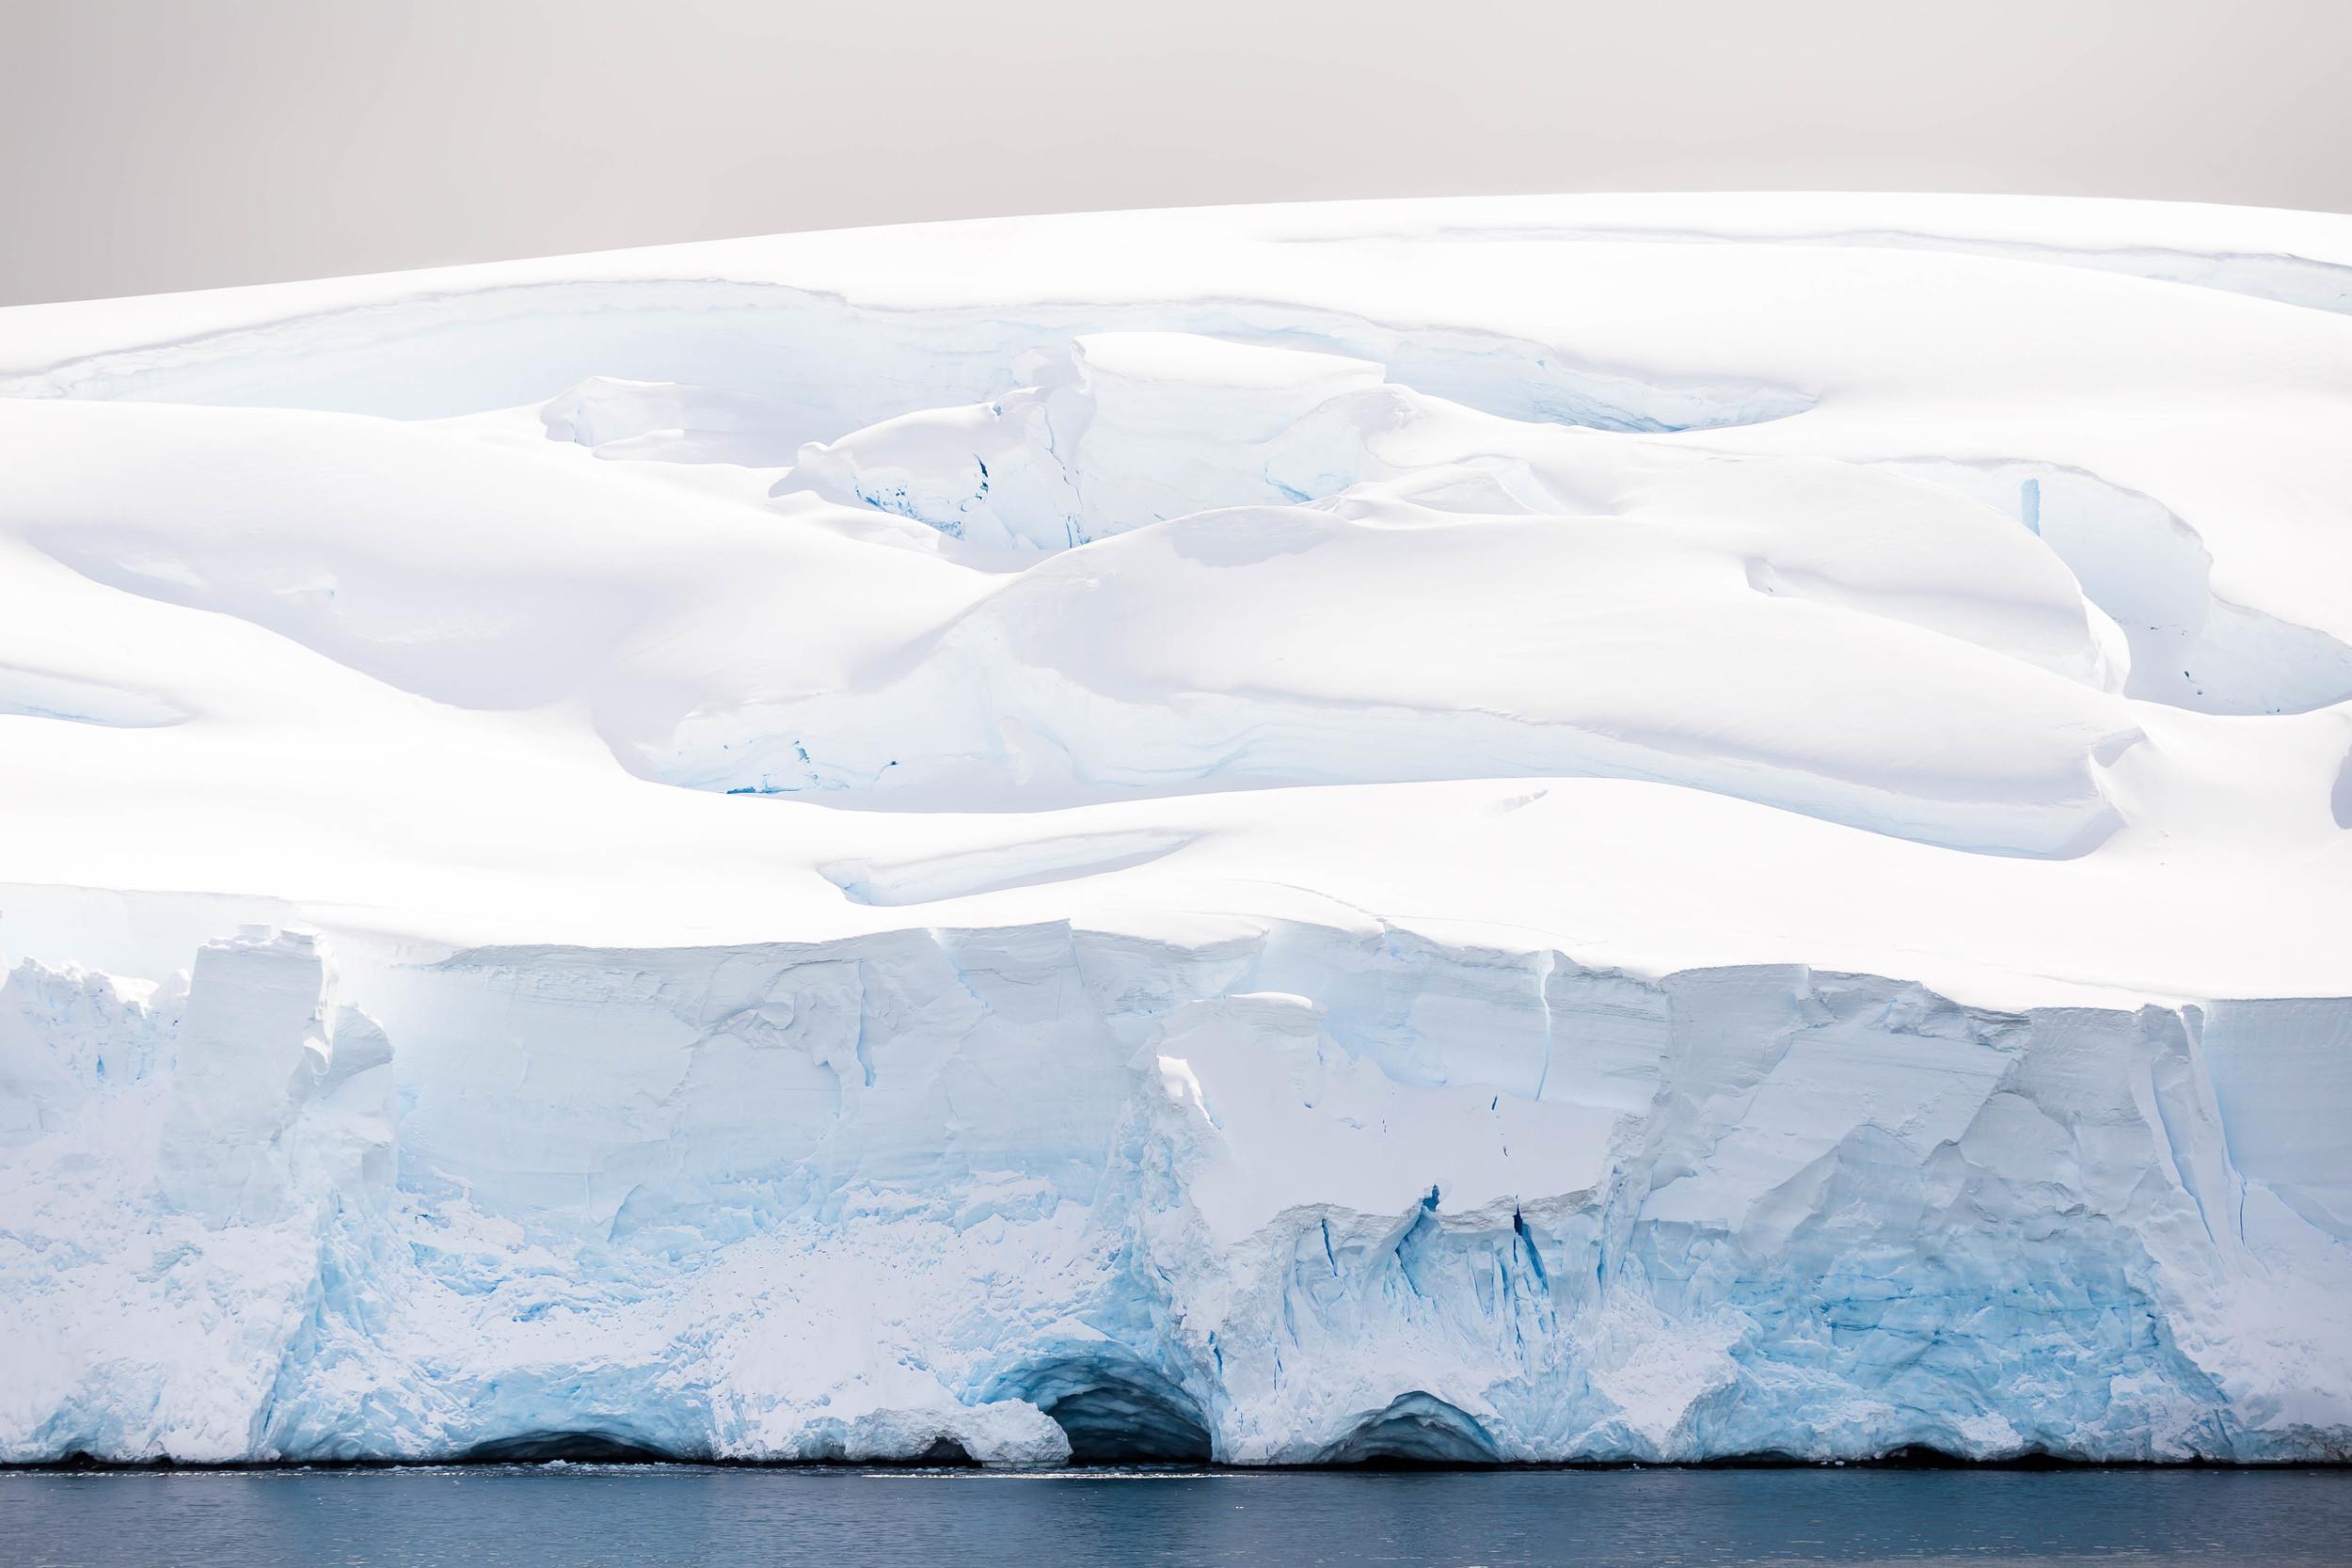 The iconic blue, so common to glacier faces in Antarctica. Salvesen Cove, Antarctica.